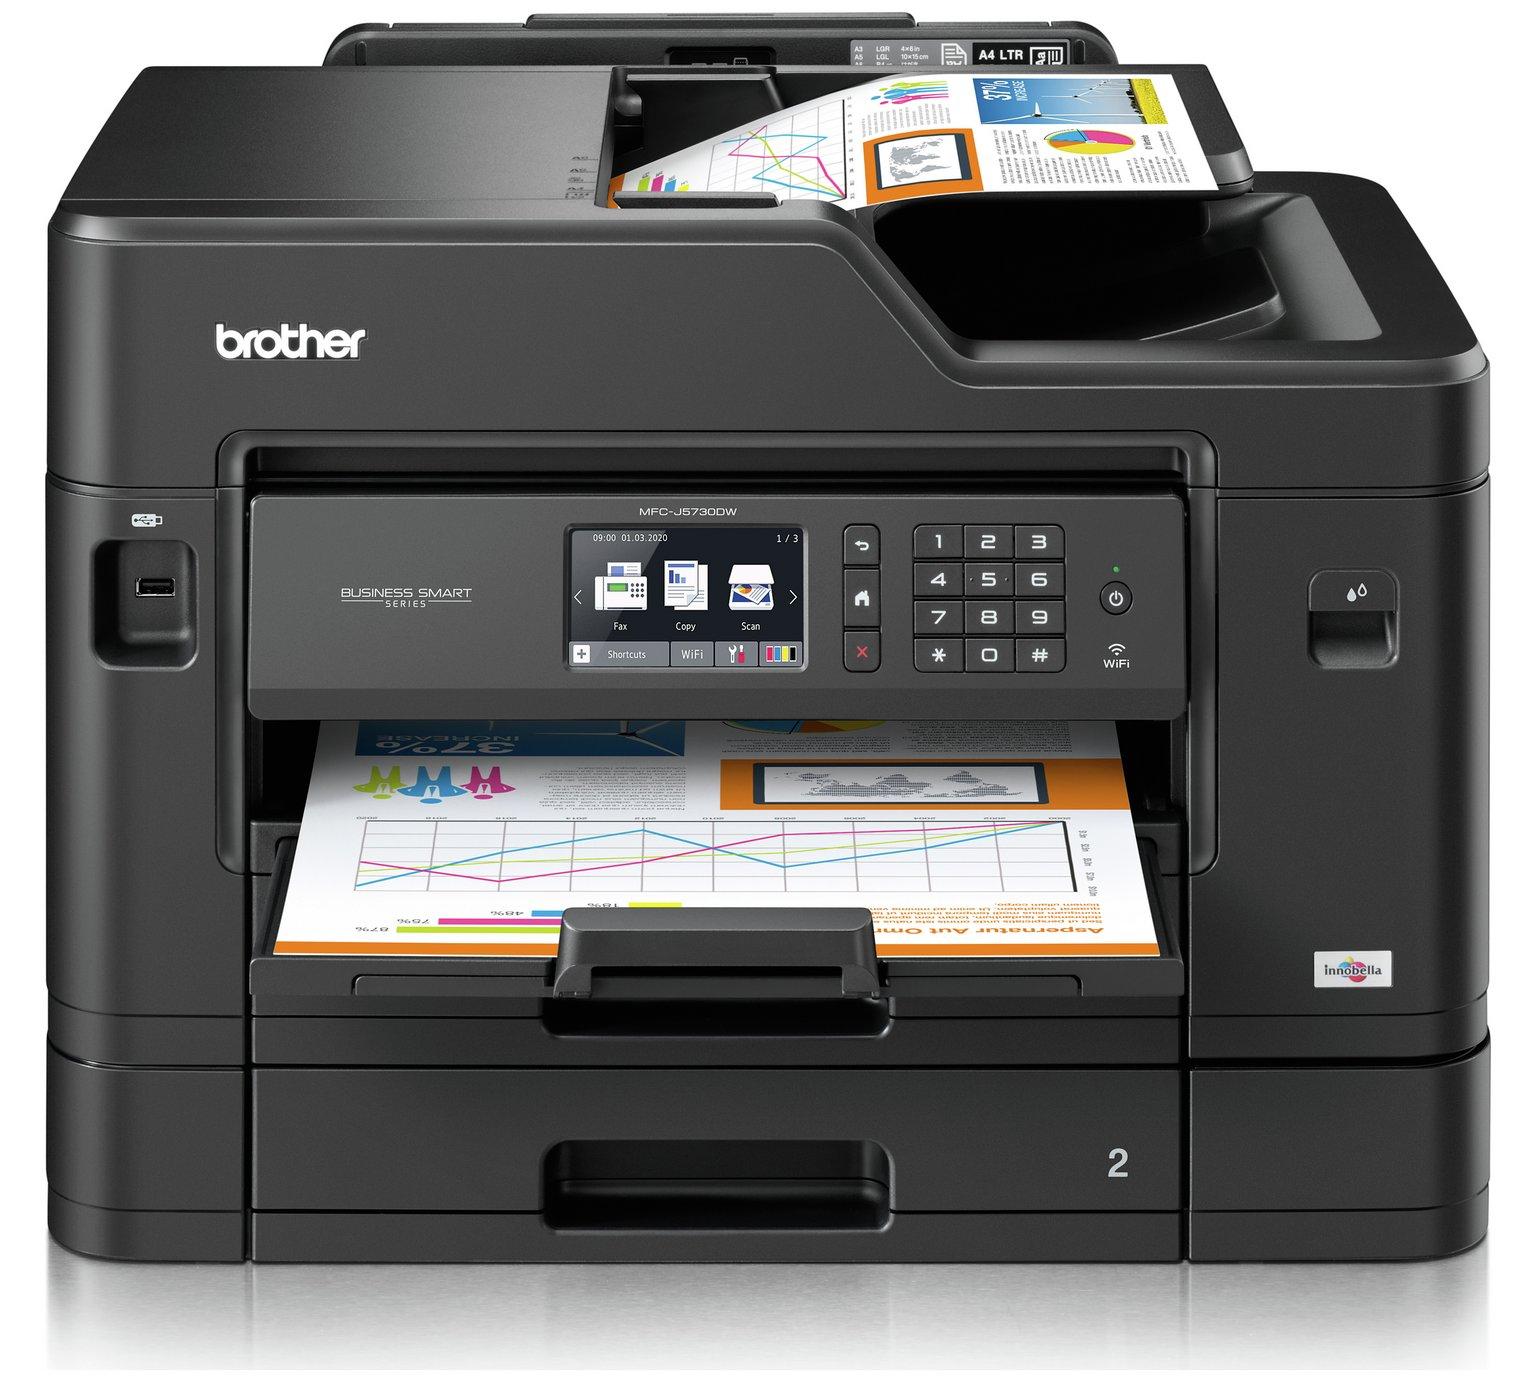 Brother MFC-J5730DW All-in-One Inkjet A3 Printer duplex scanning & printing £149.99 @ Argos plus £50 cashback + 3 year warranty via claim